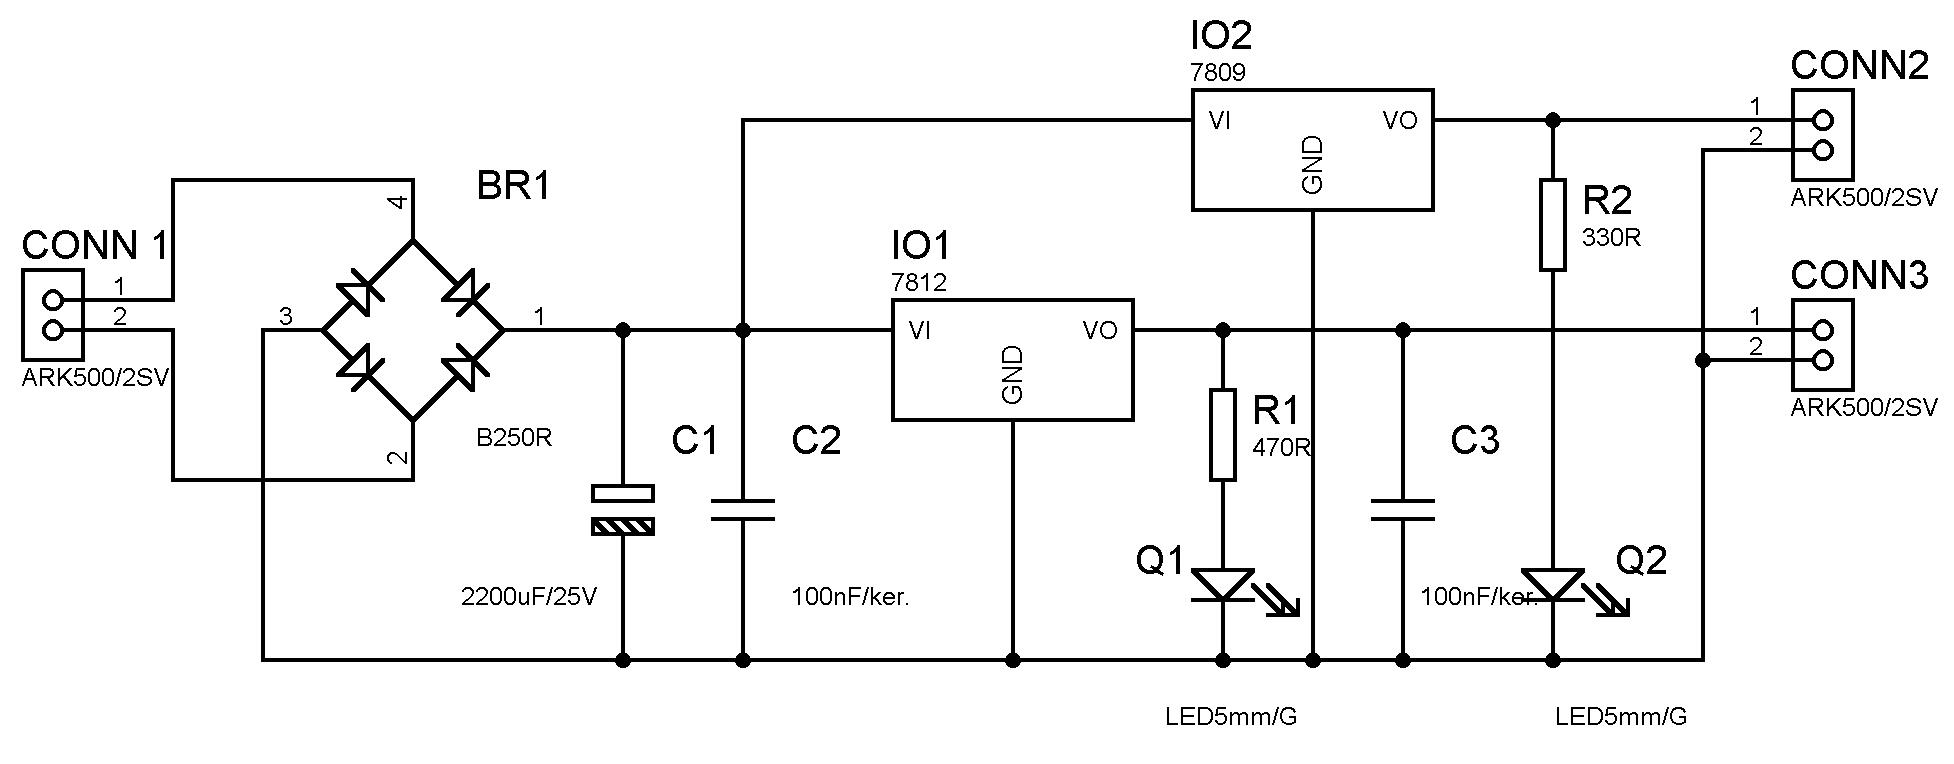 Konstrukce Laboratornho Zdroje 0 30v 5a Vvojhwcz 7805 Schema Kliknutm Na Obrzek Link Is External